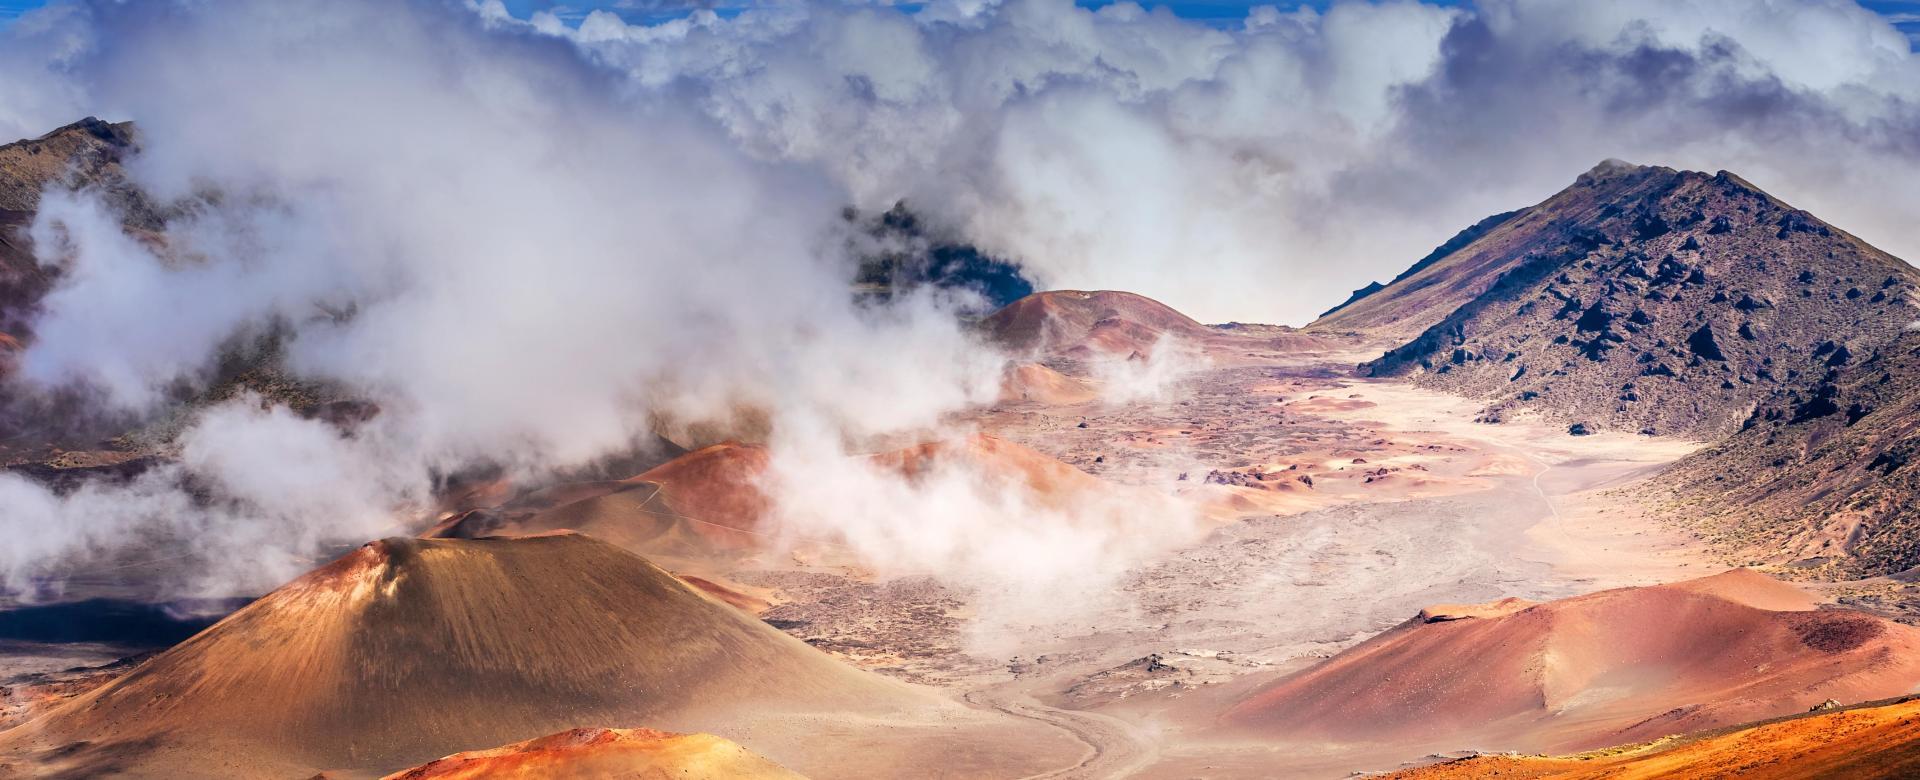 Trekking États-Unis : Hawaii, entre volcans et tropiques